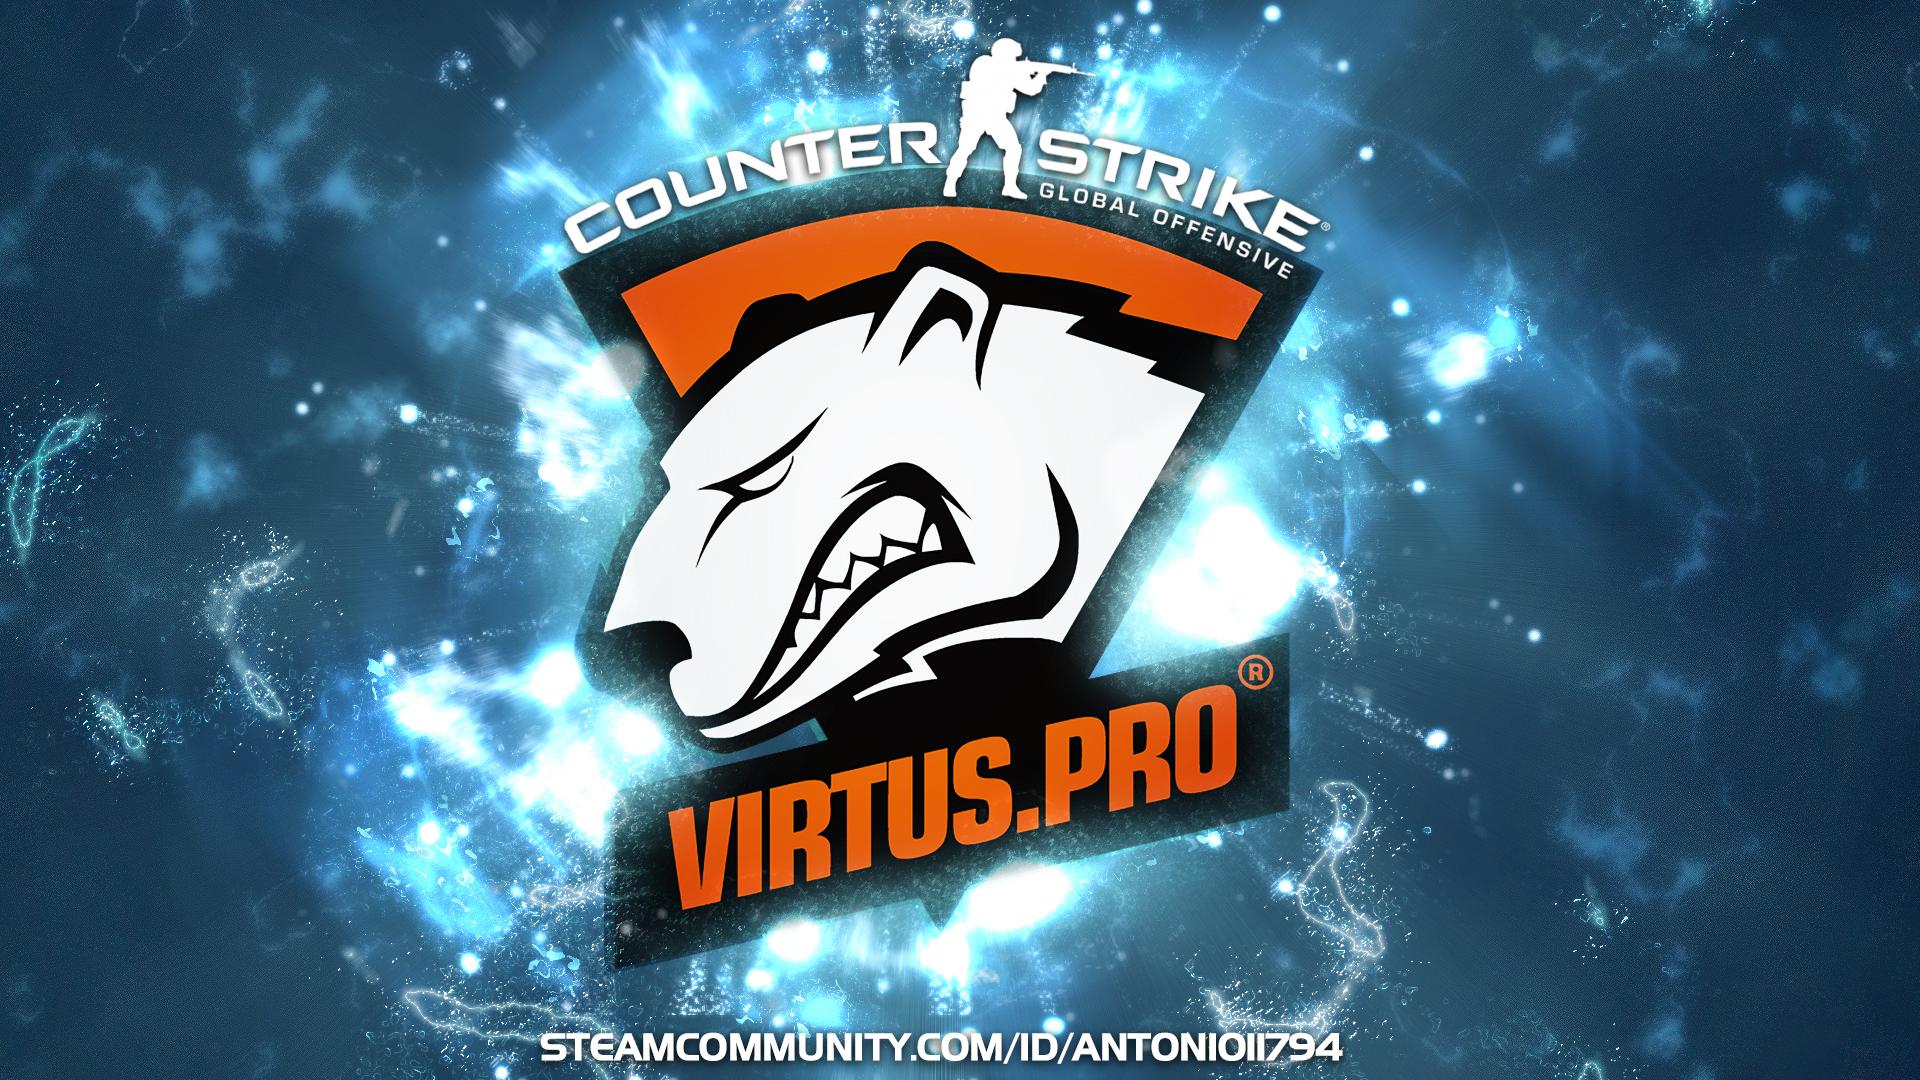 Virtuspro Csgo Wallpaper 1080p By Antonio11794 On Deviantart